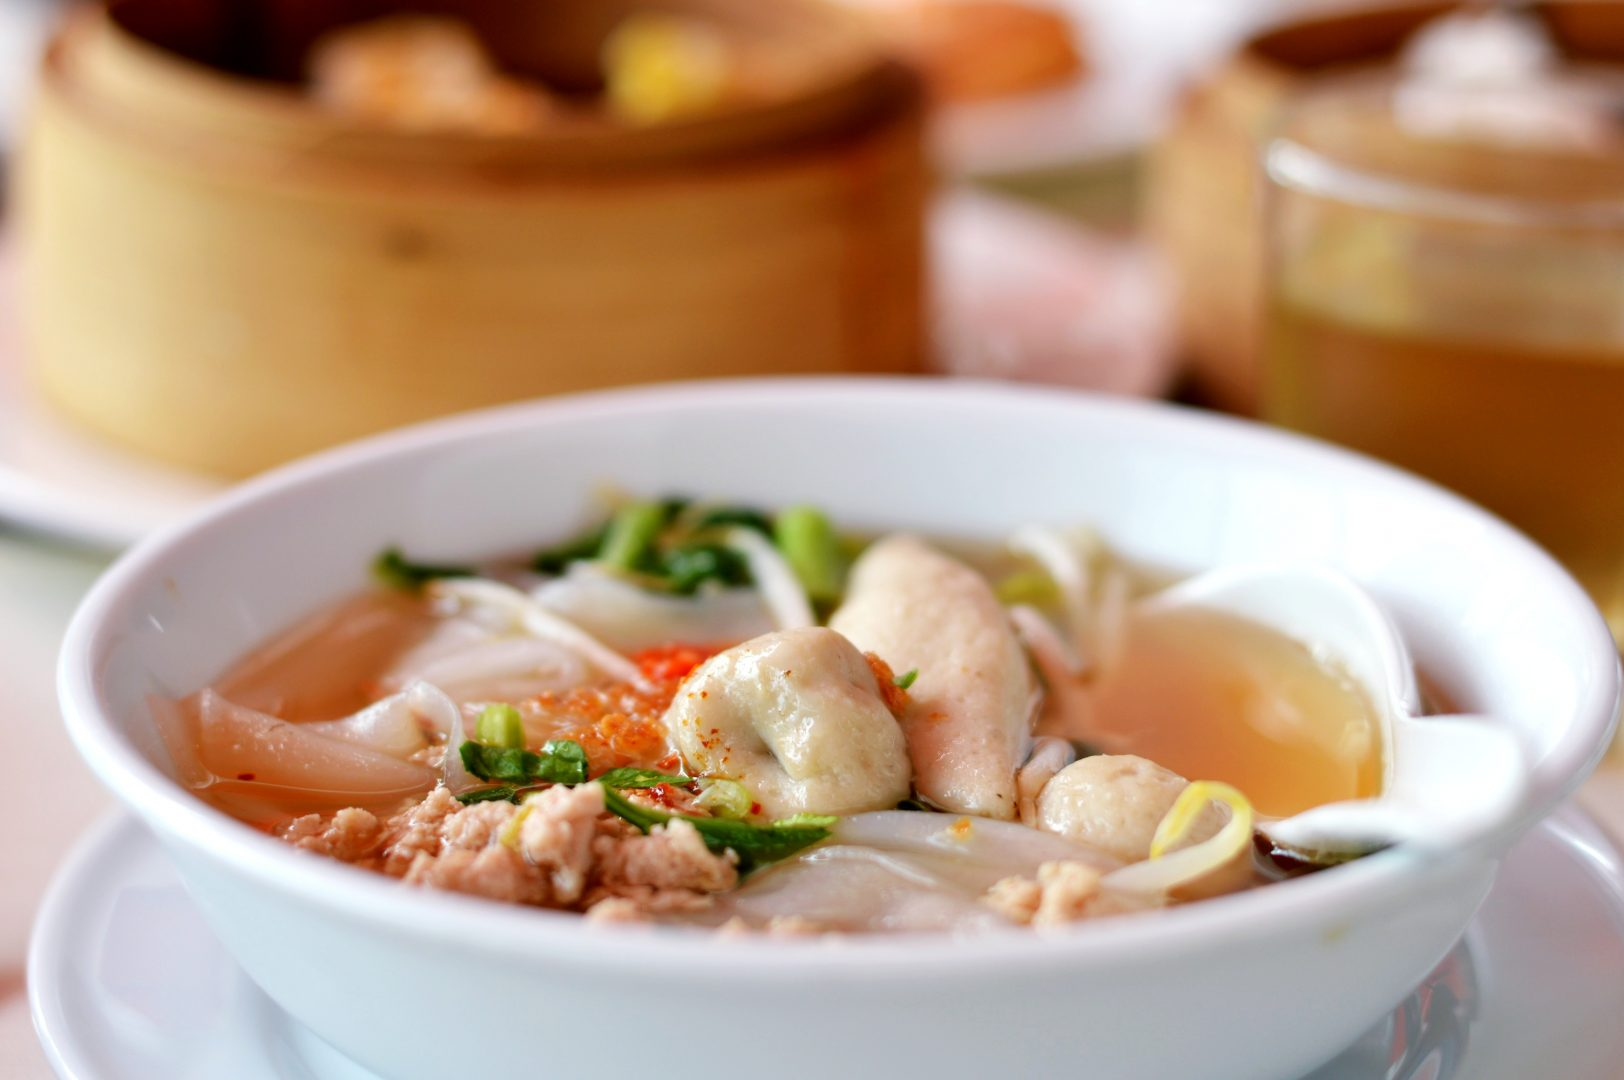 Das musst du in Thailand essen: Kuai Tiew| www.dearlicious.com